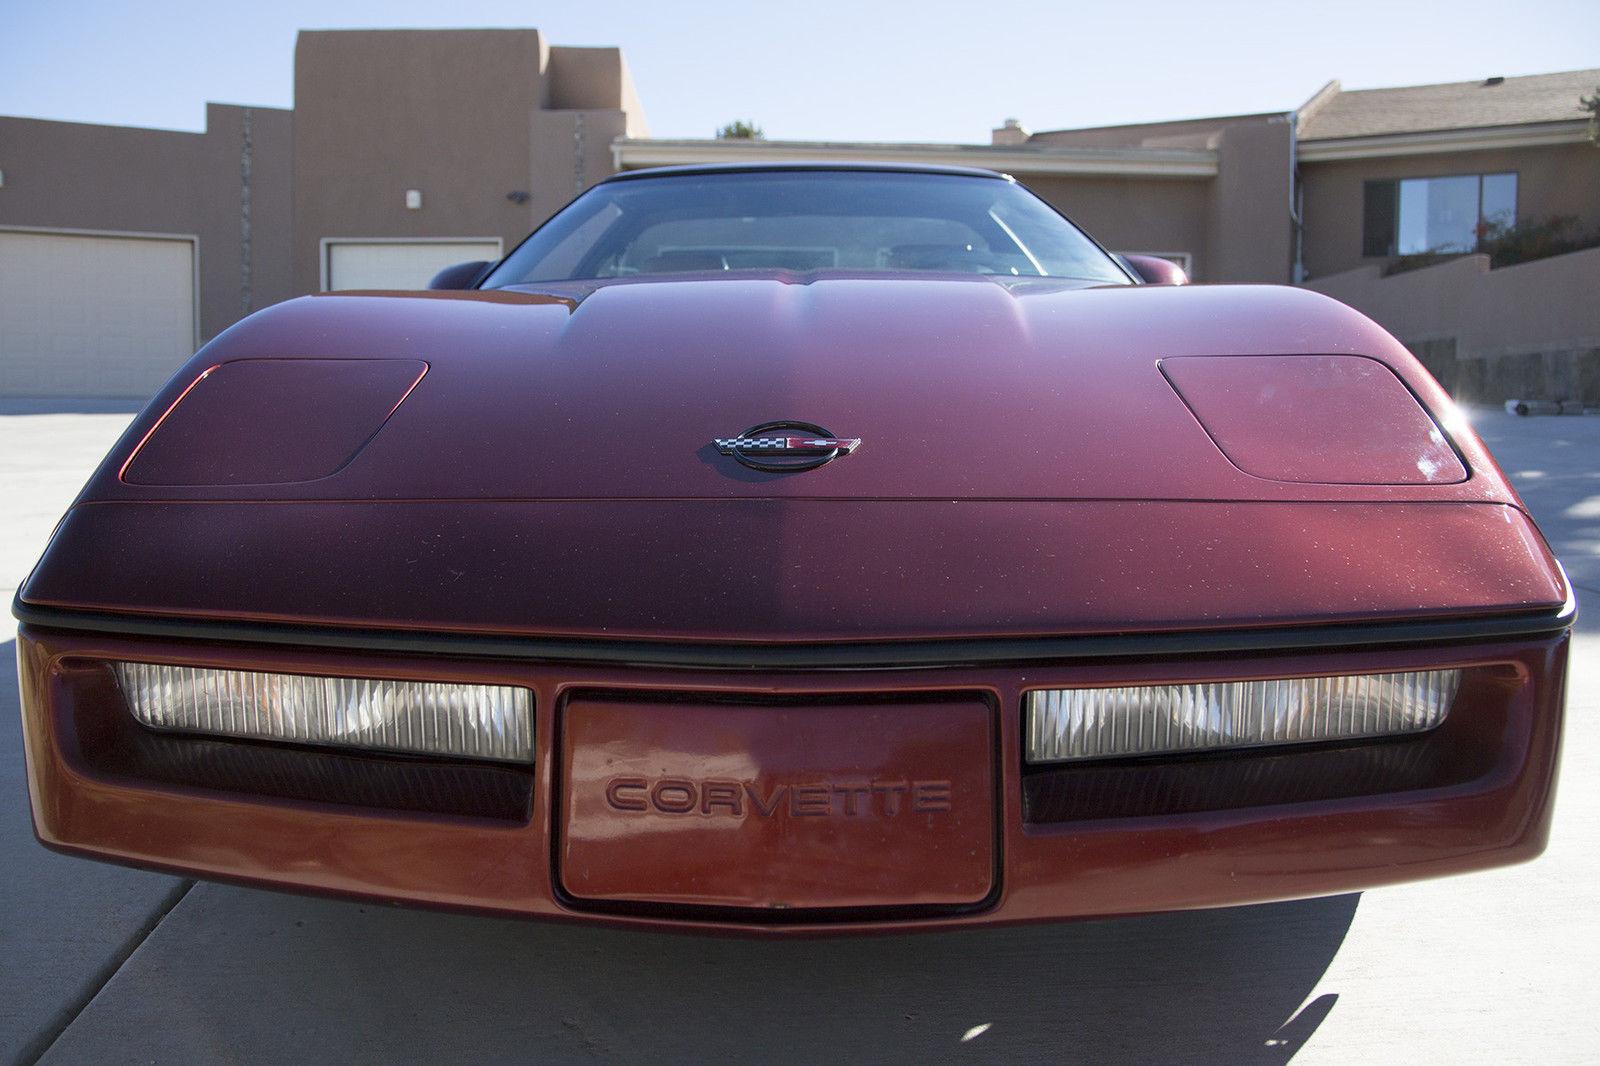 1987 Vortech Supercharged L98 Corvette Coupe Red manual Z52